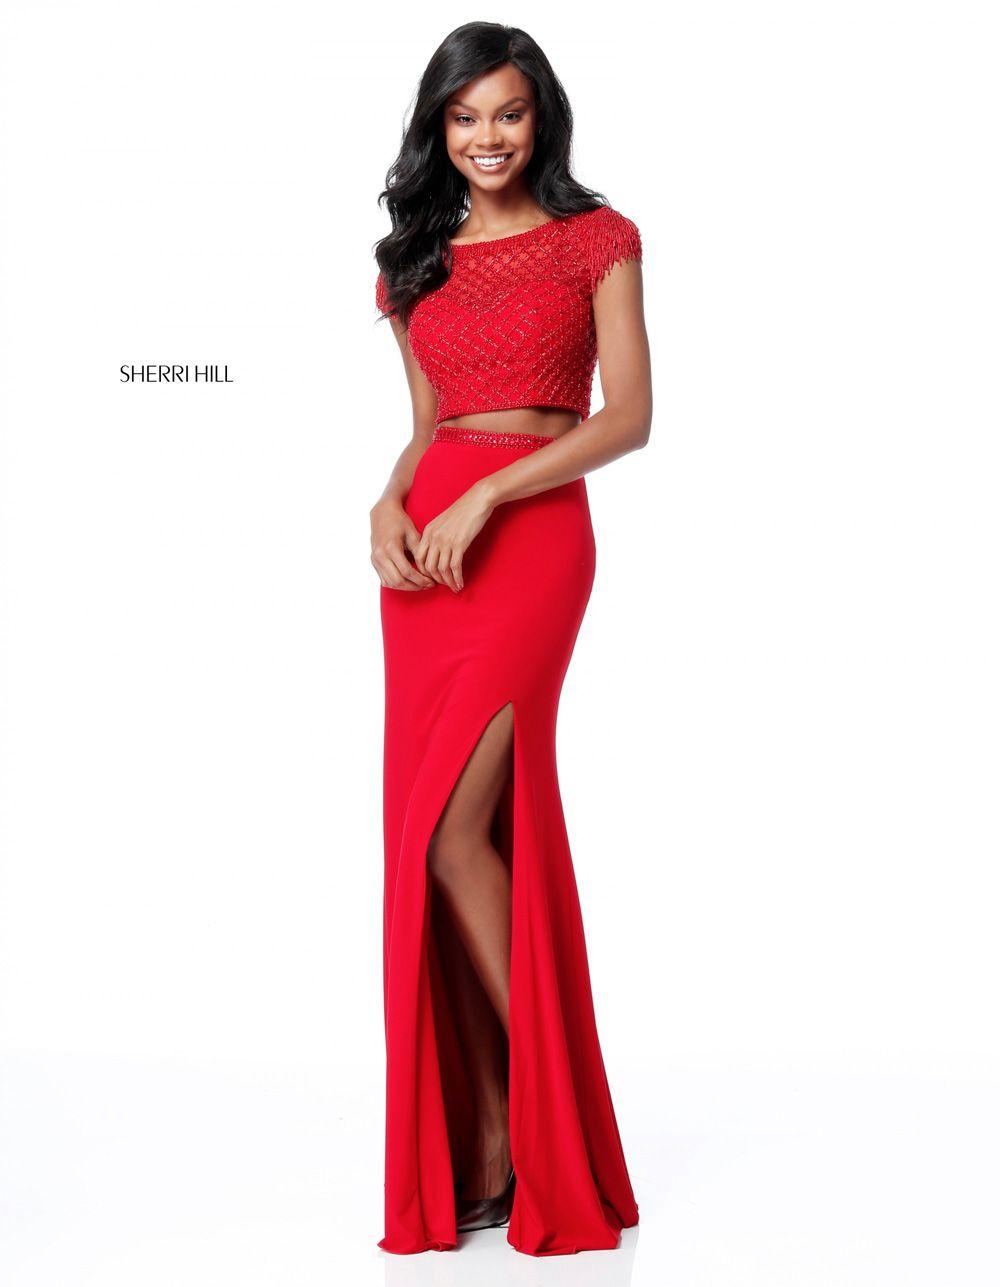 vestido de graduacion corte sirena 2018 (9)